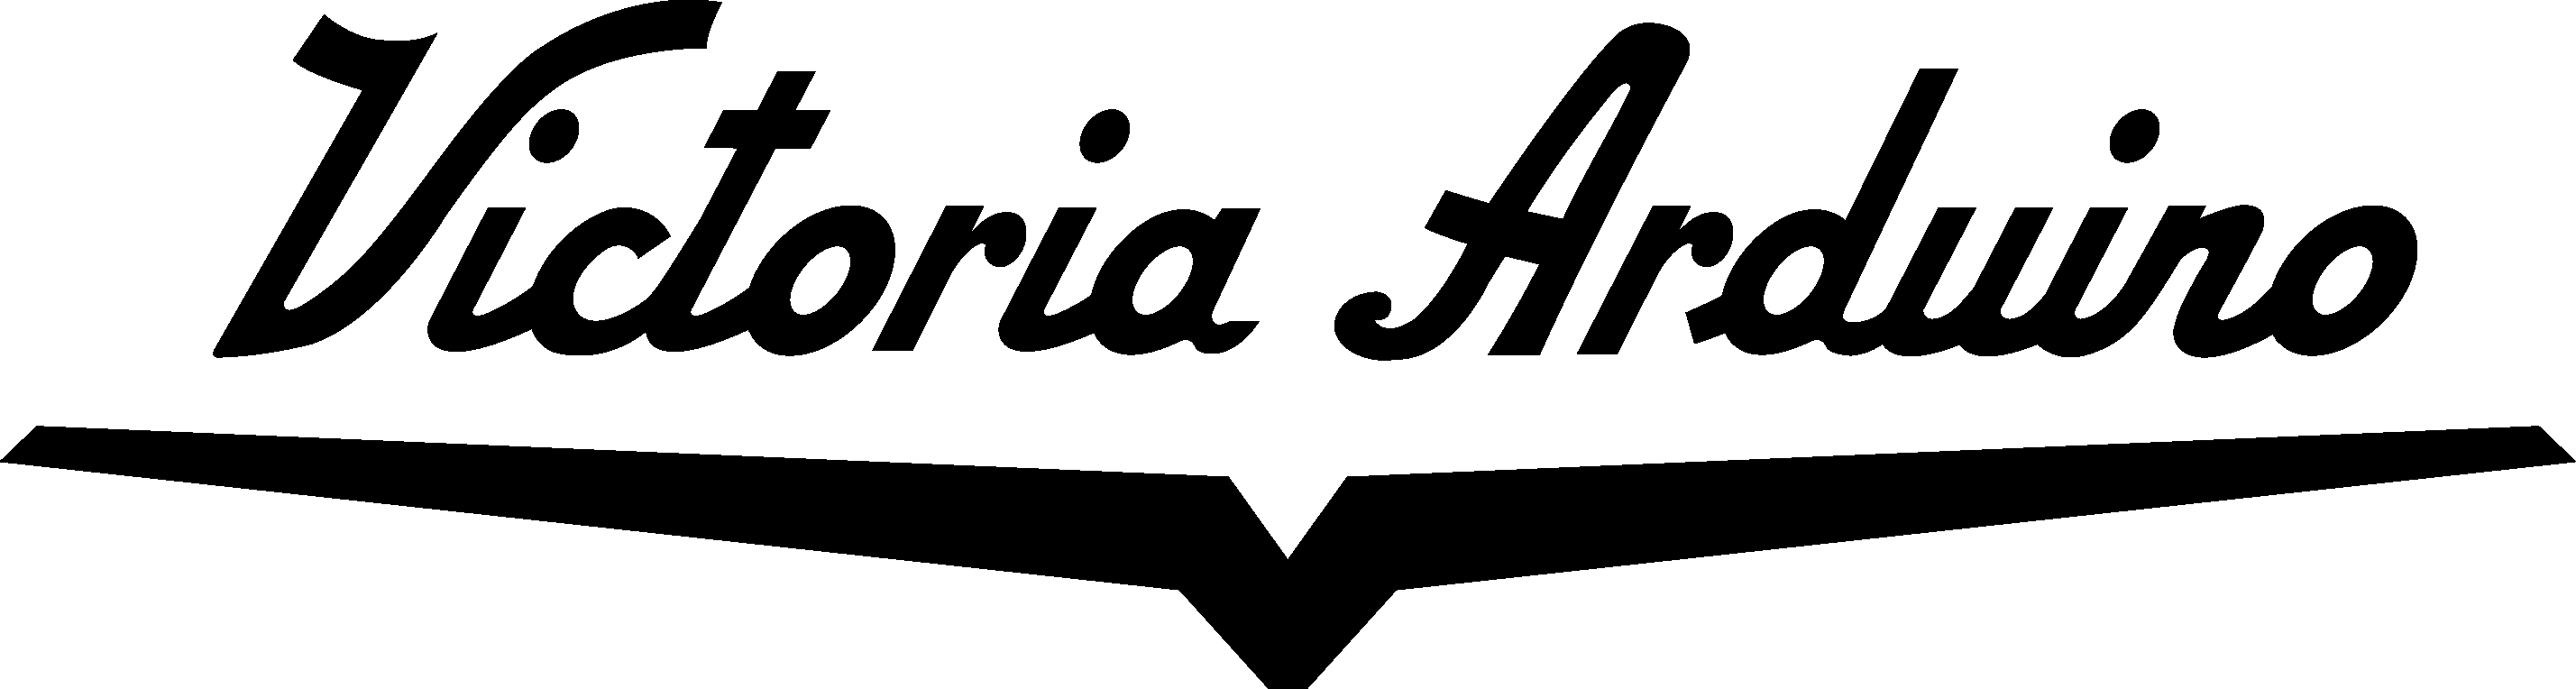 اسپرسو ساز victoria arduino